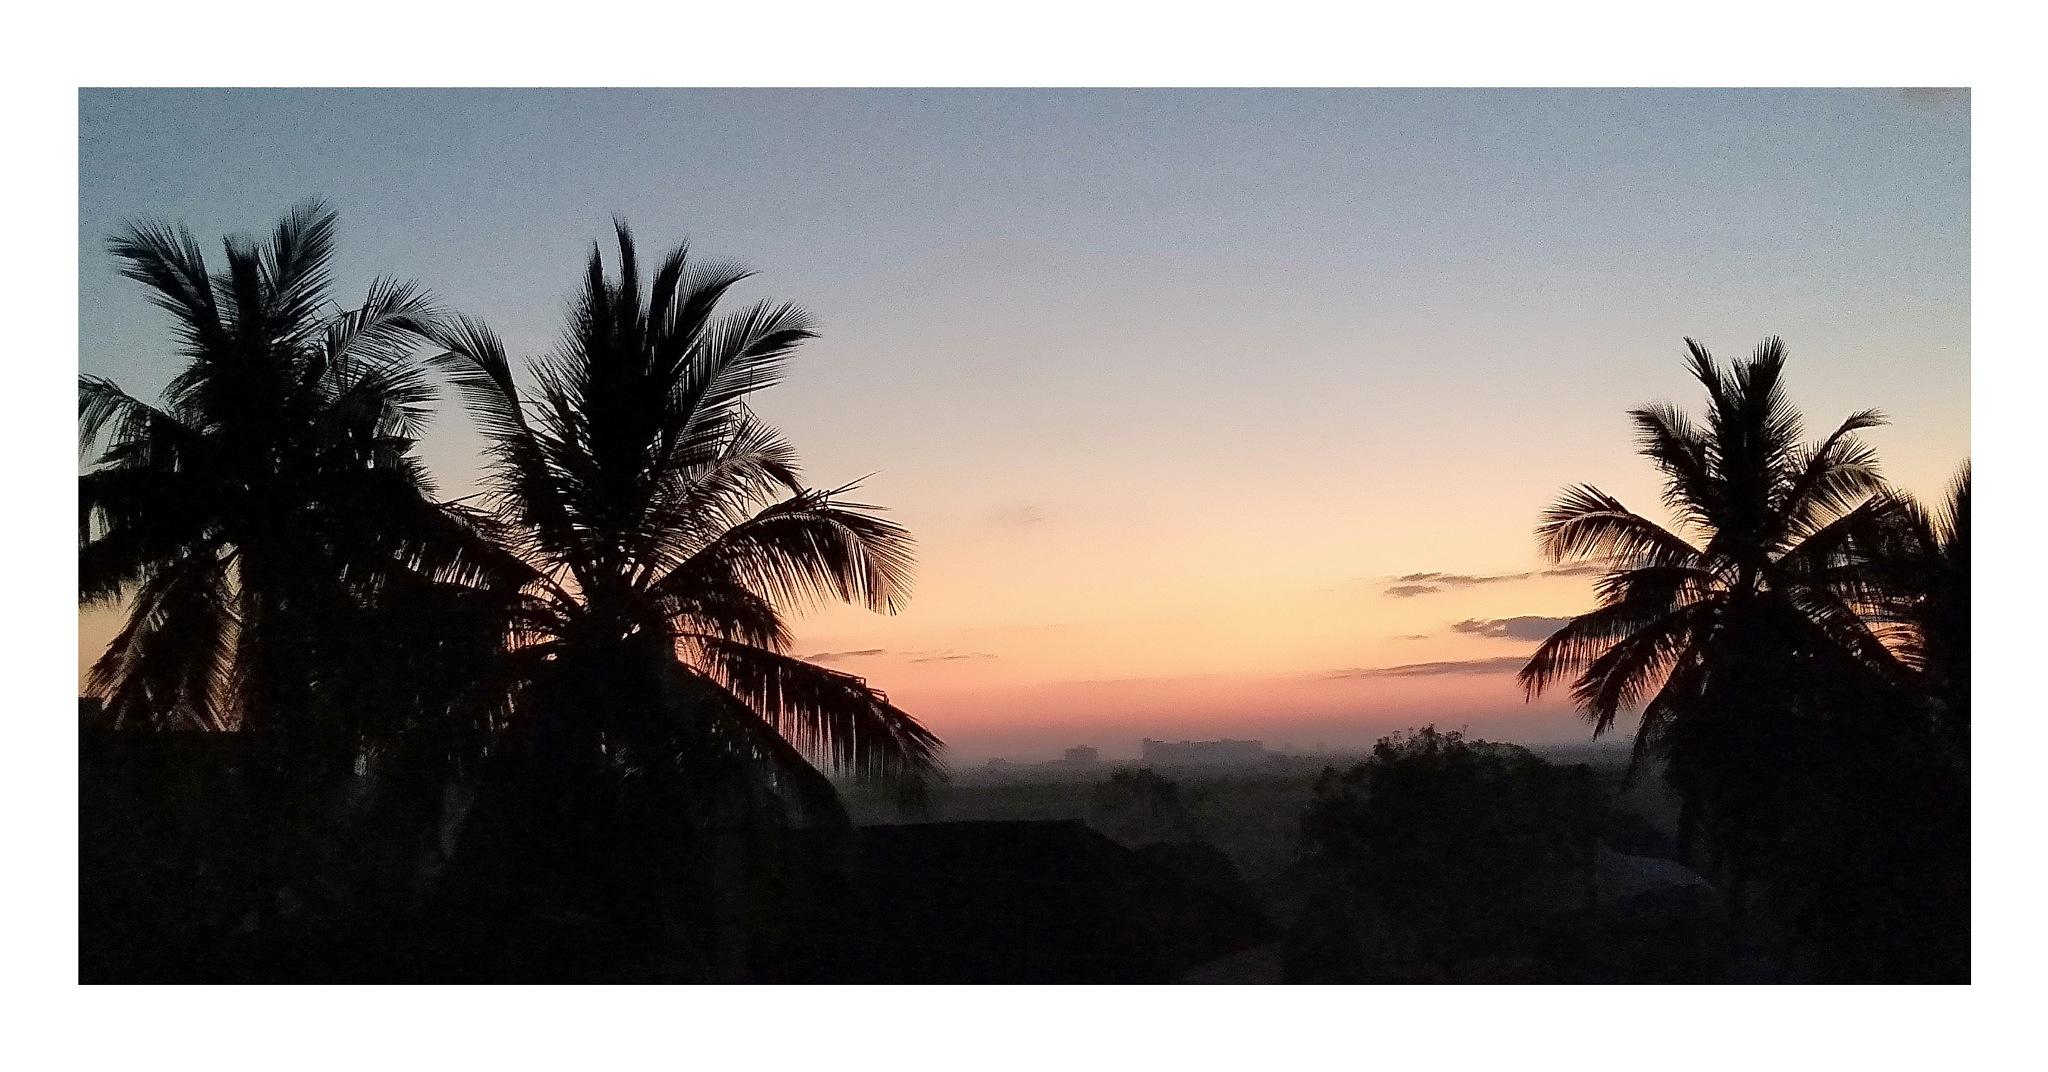 Nature sunrise by Rishi Reddy